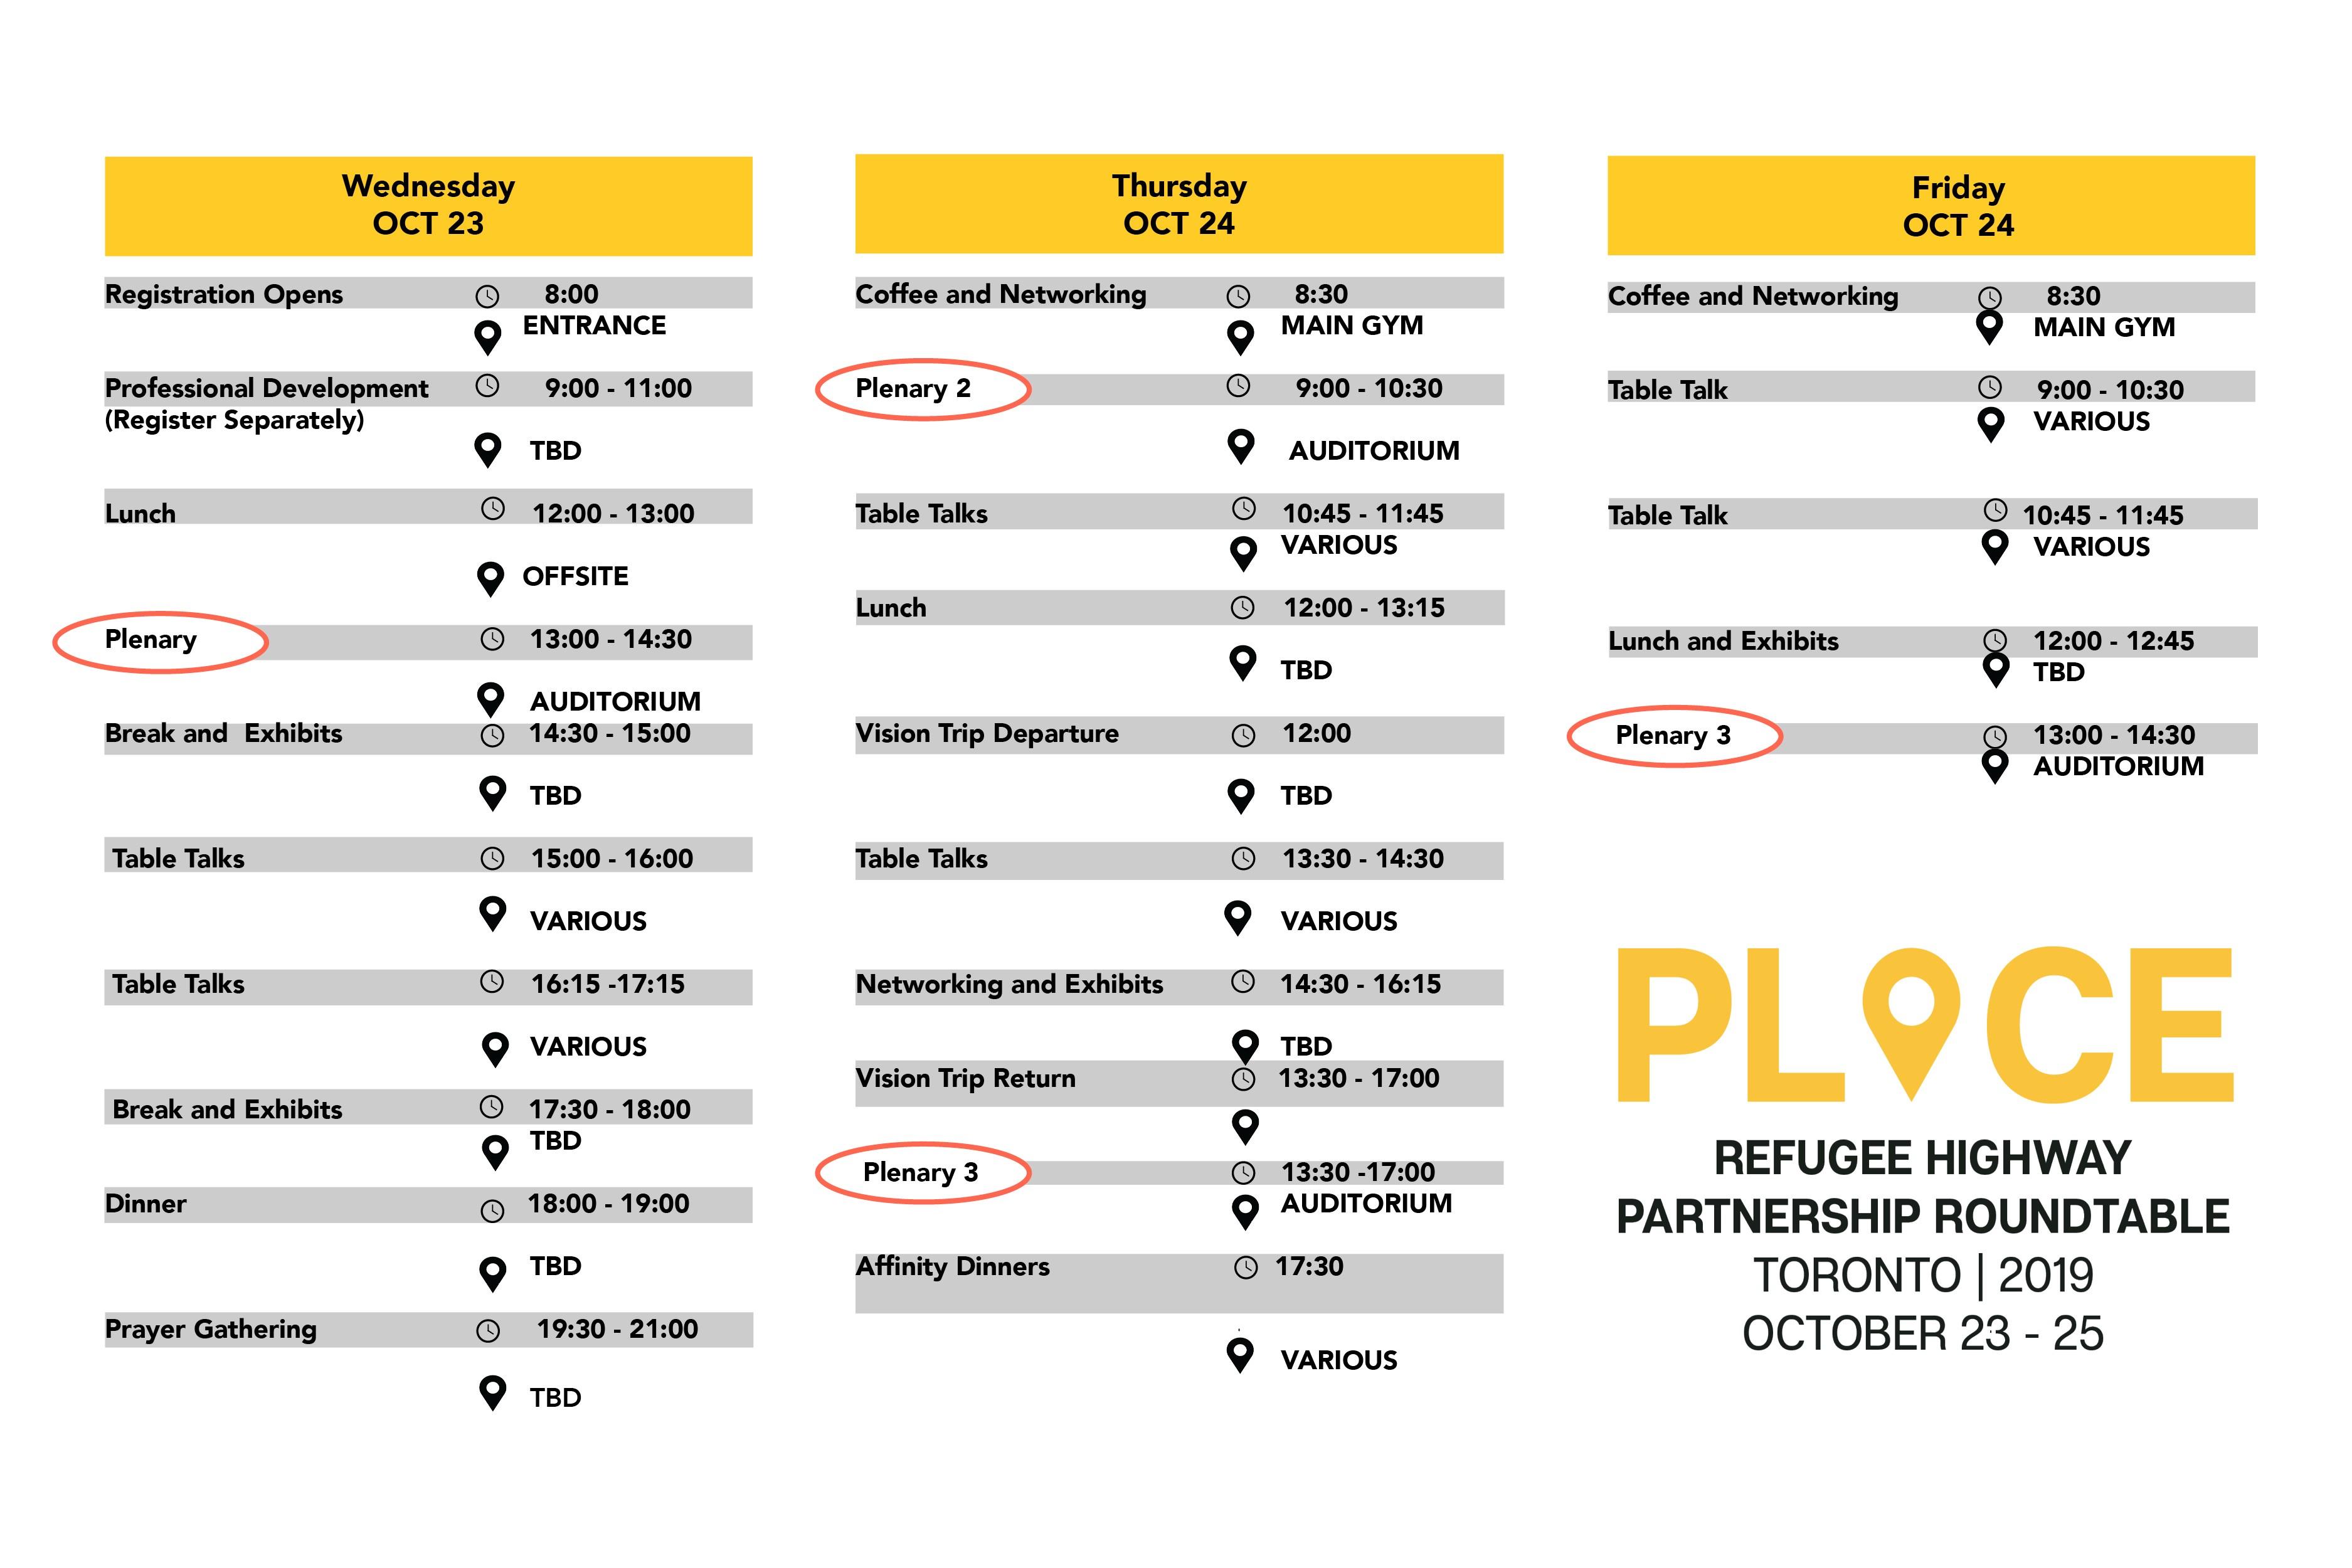 Roundtable Schedule